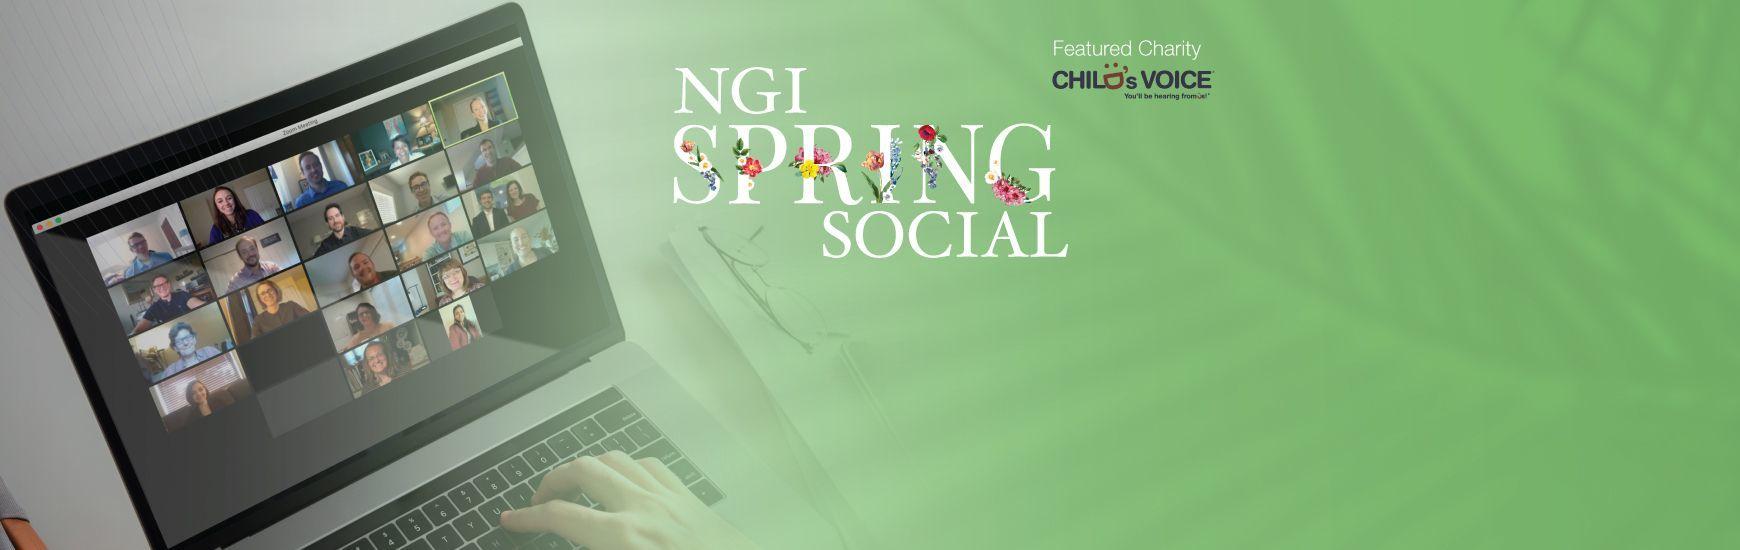 NGI Spring Social featuring Child's Voice, April 22, 5:30-7:00 p.m.